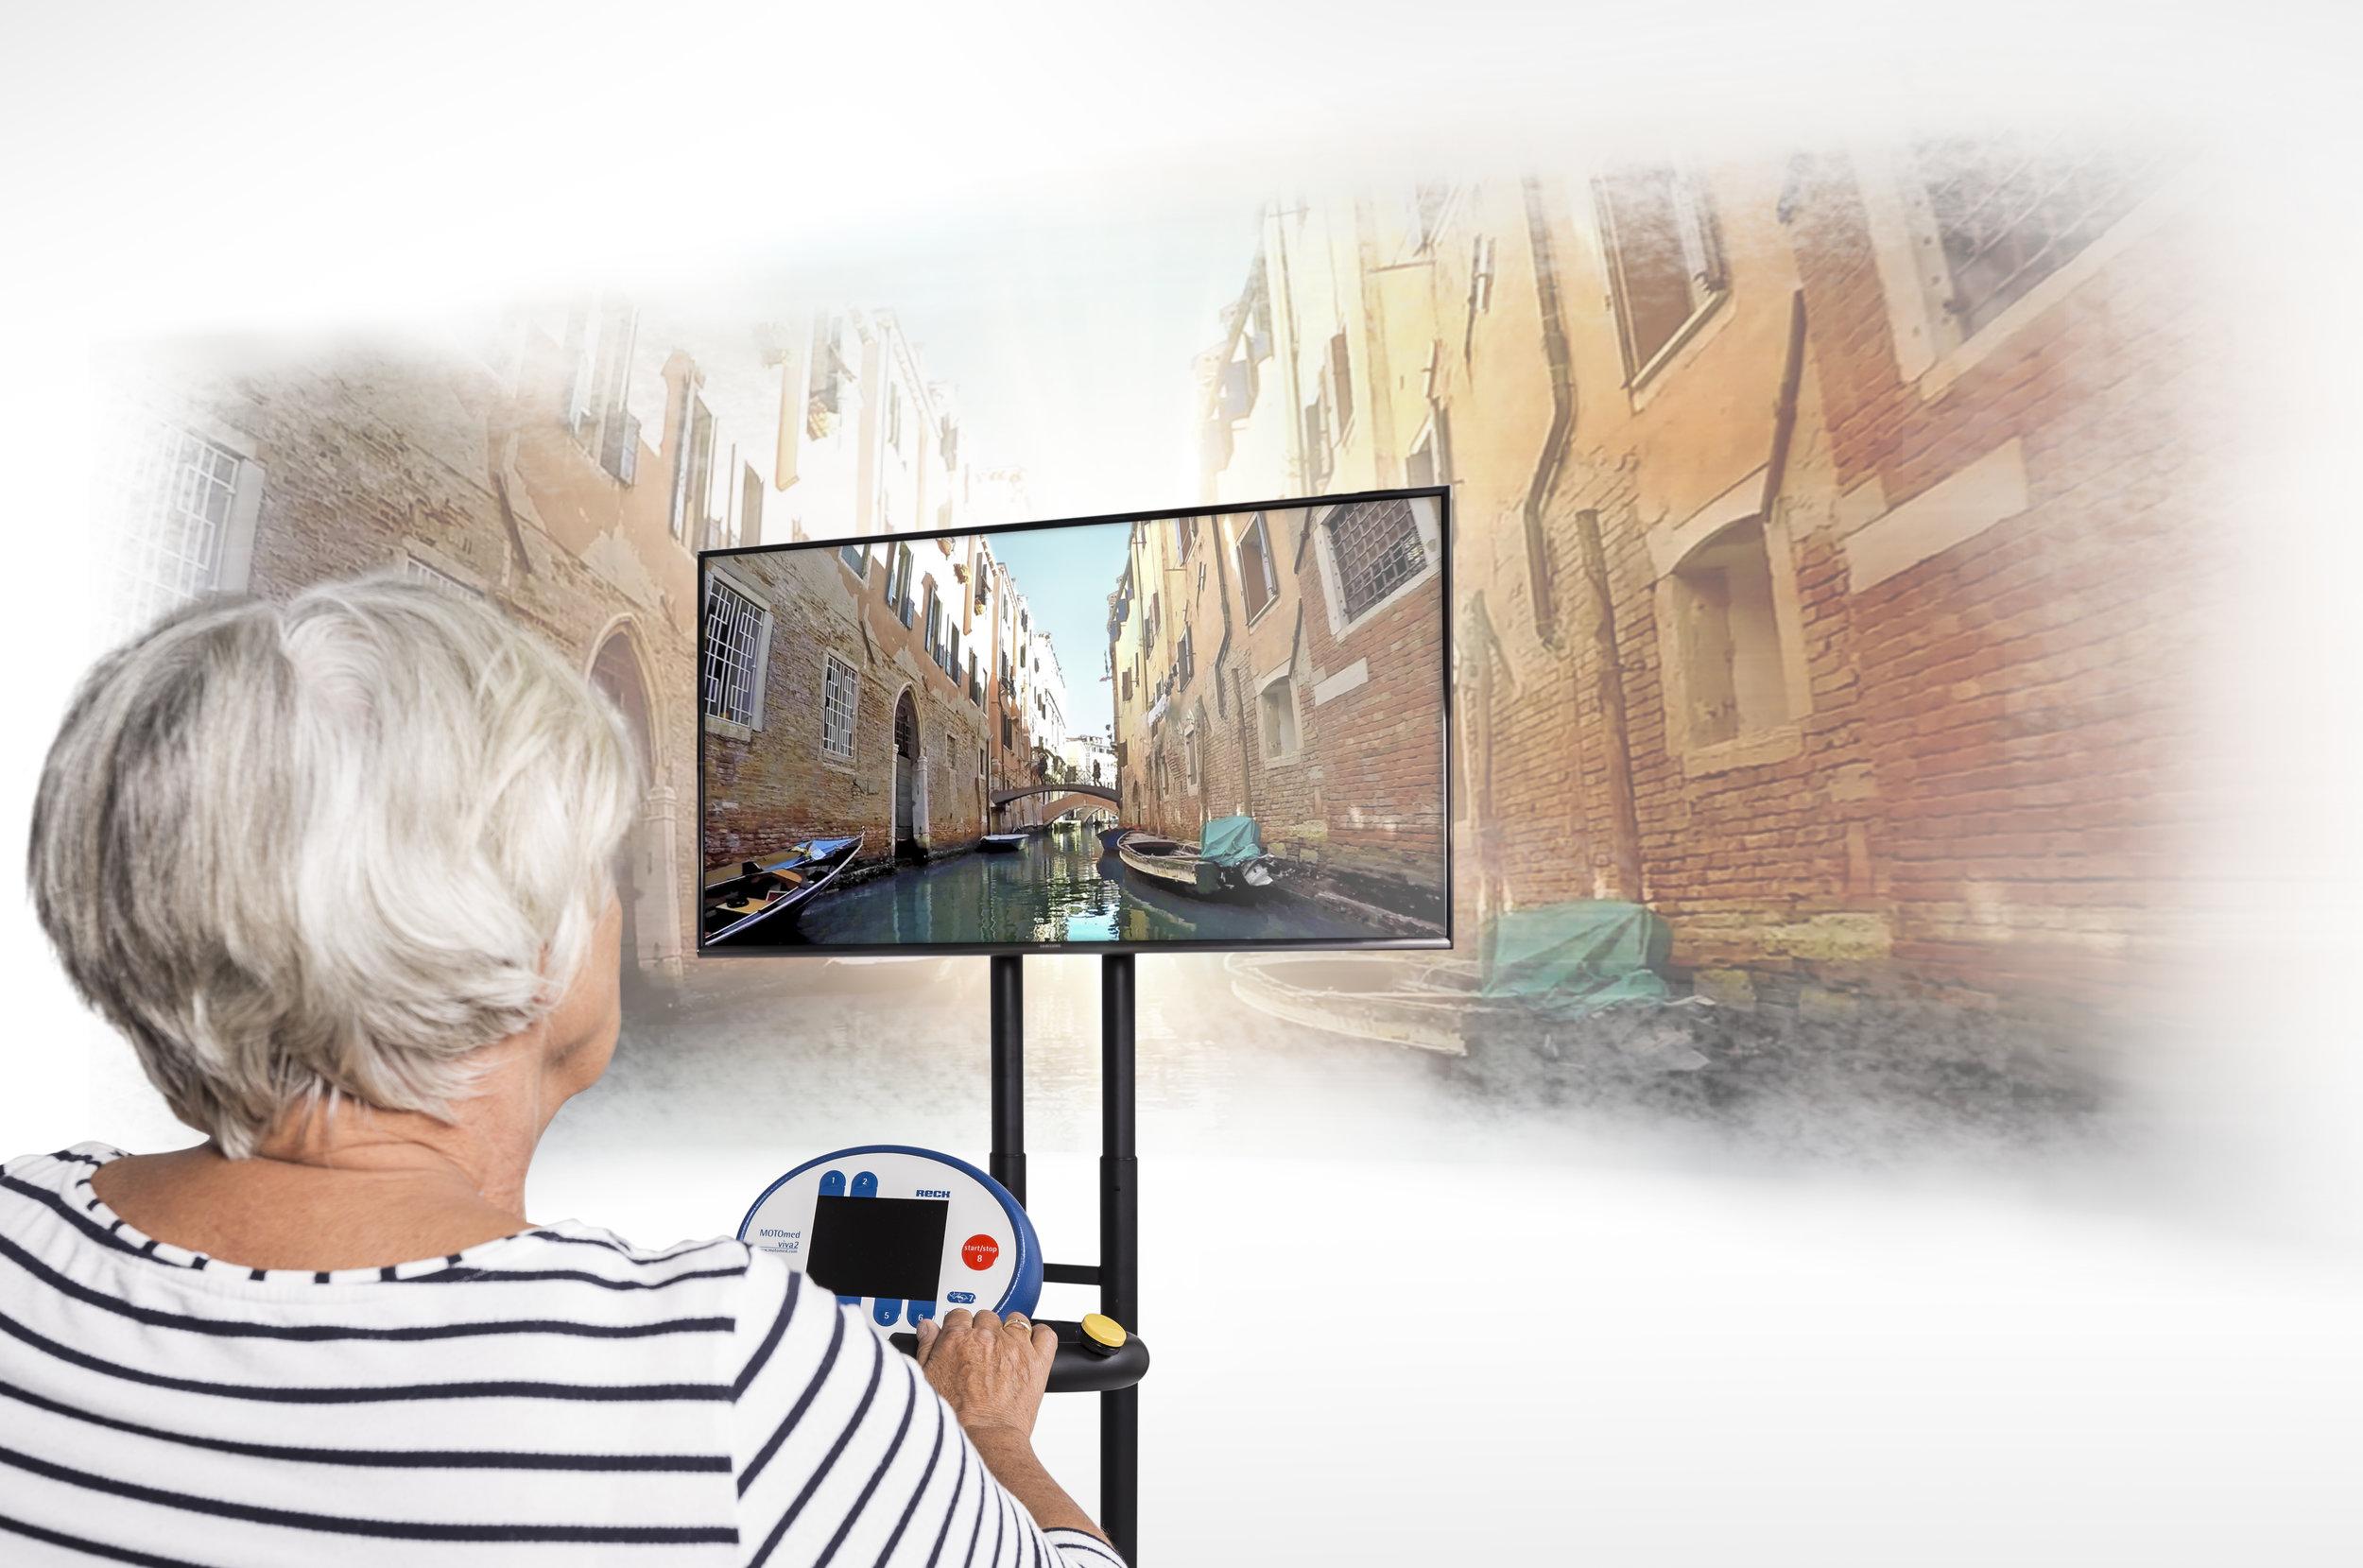 Bike Labyrinth provides a virtual reality landscape to augment cycling